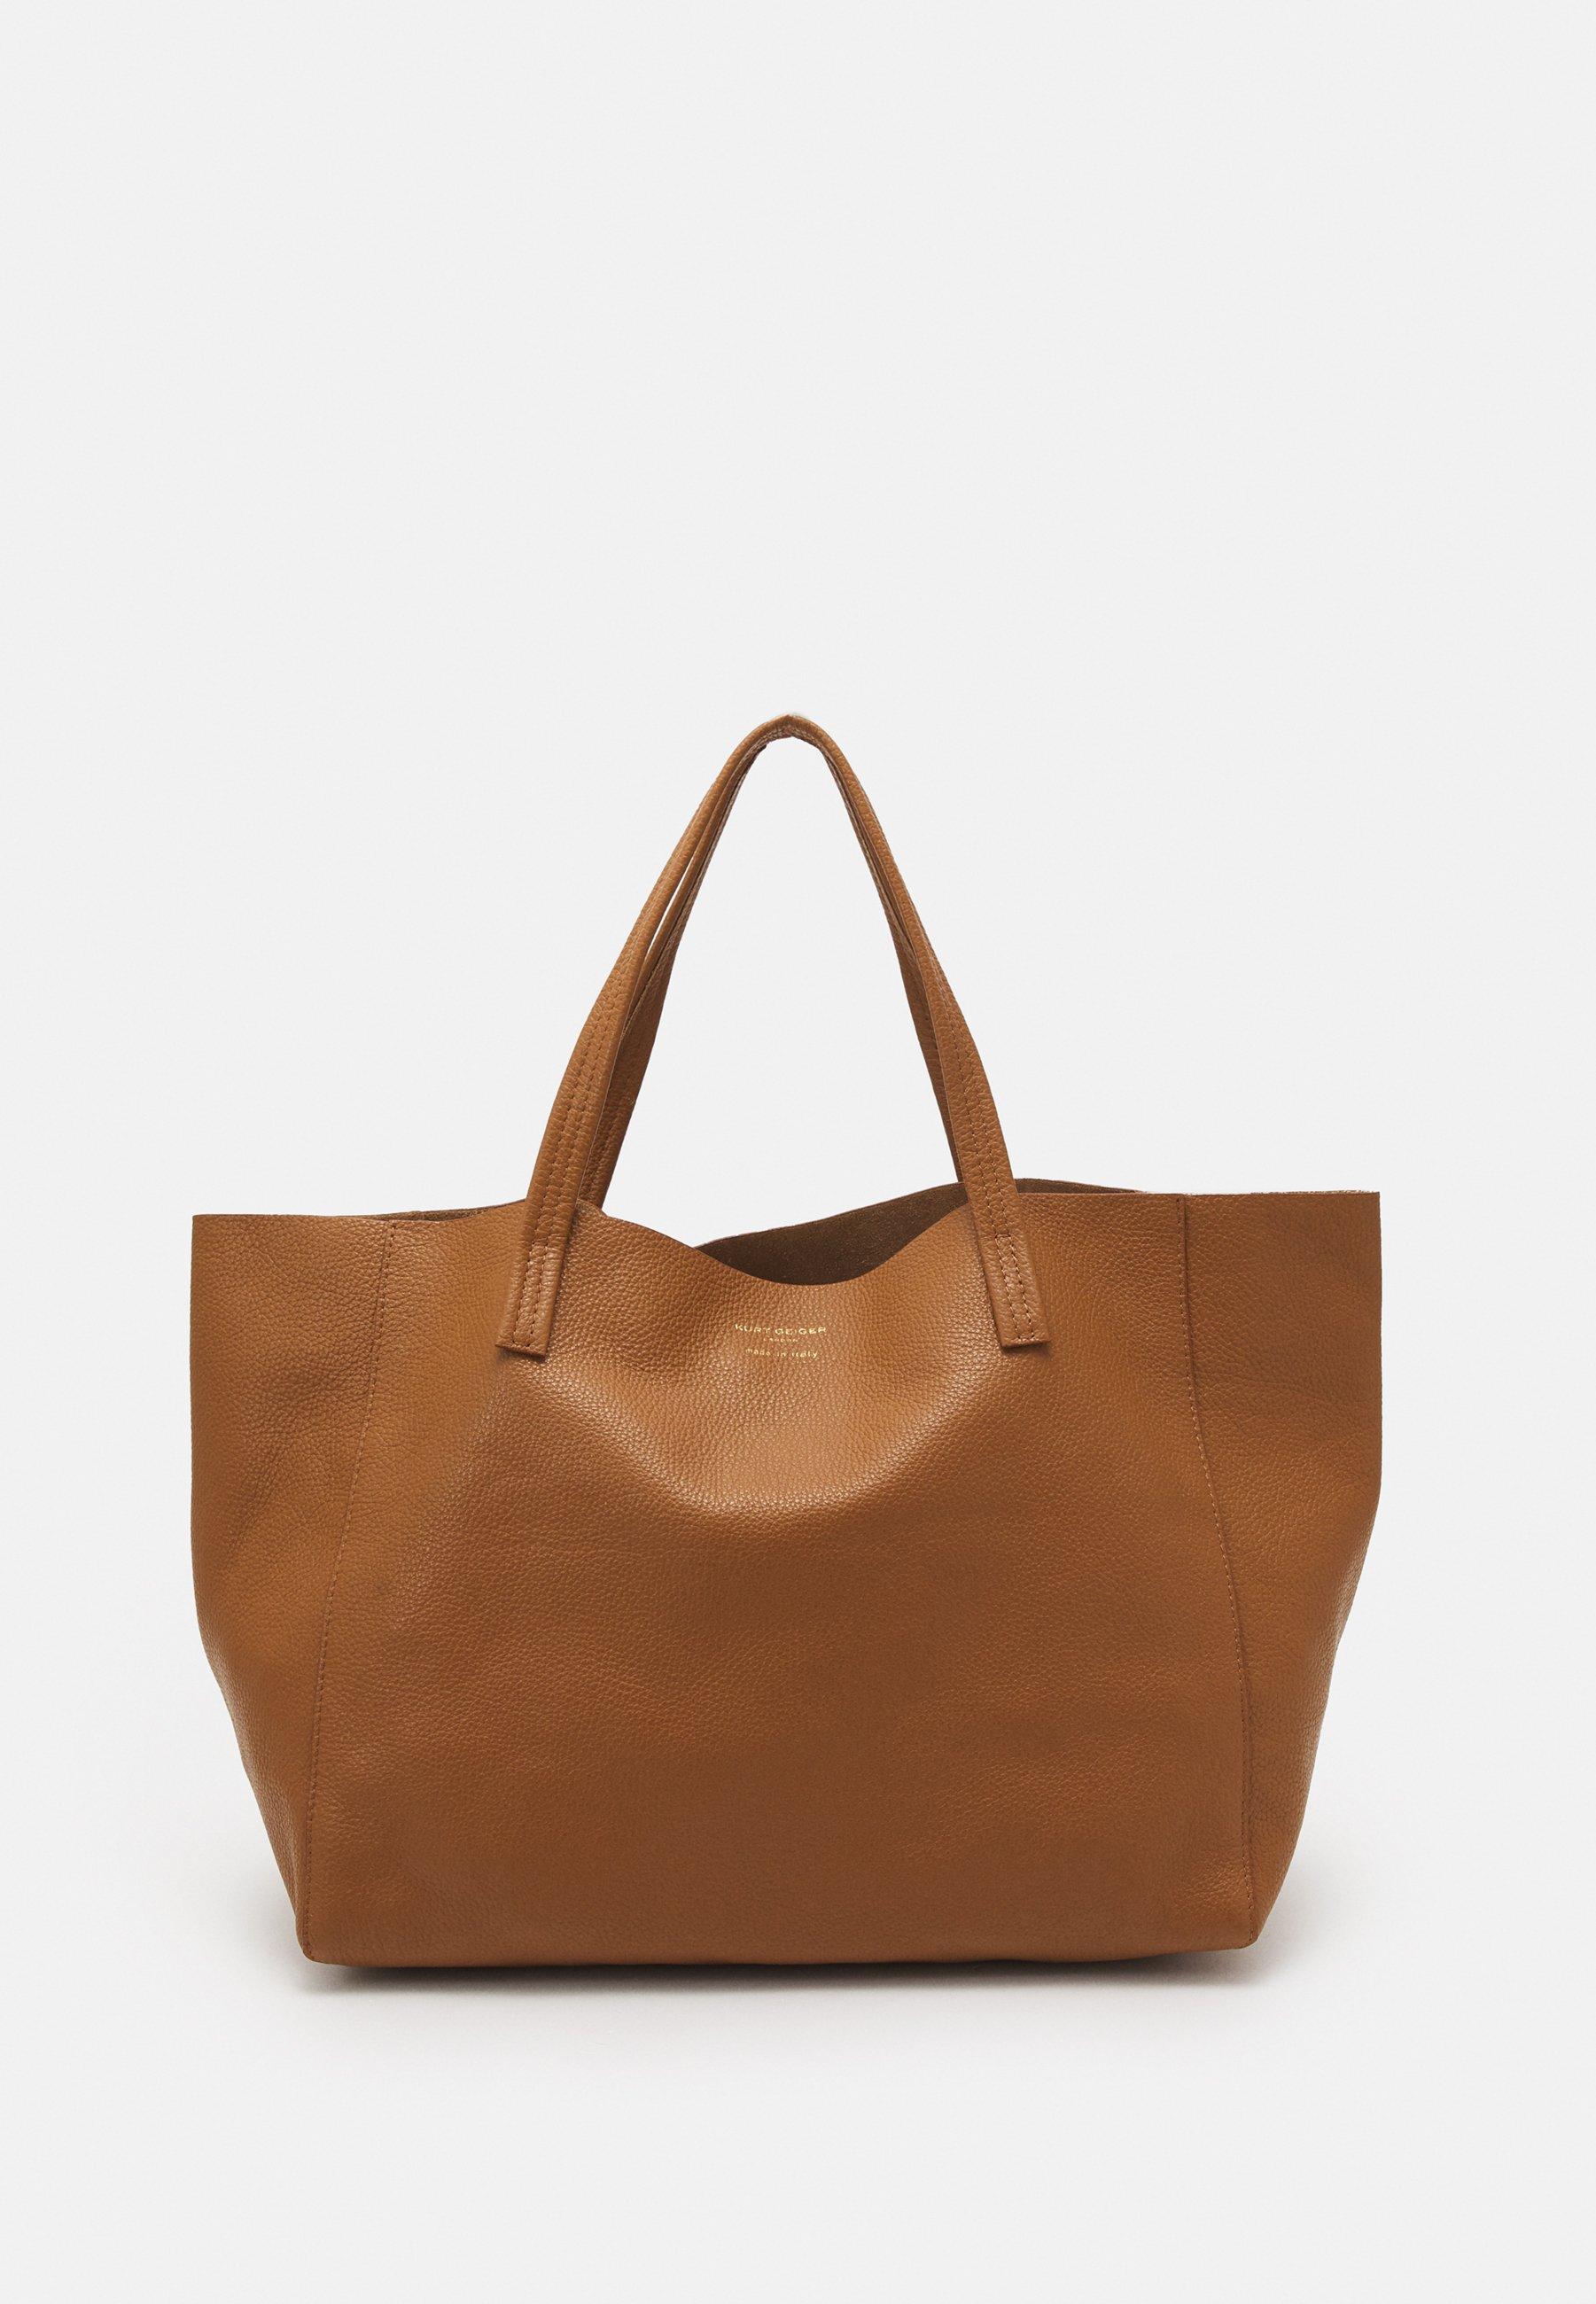 Women VIOLET HORIZONTAL TOTE - Tote bag